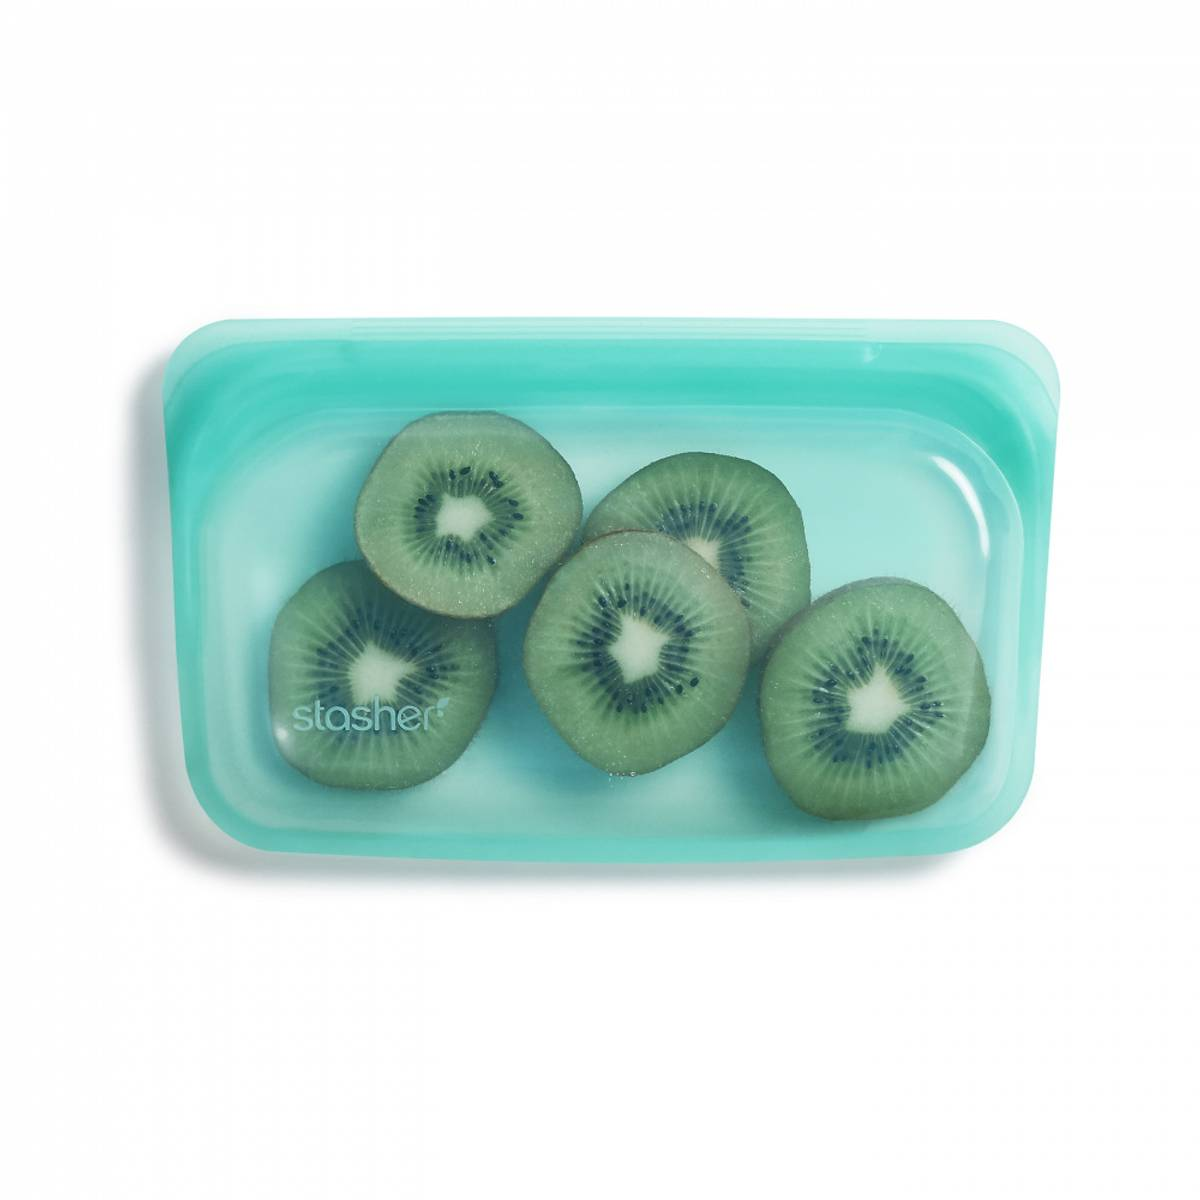 Stasher Snack, Aqua / Stasher Bags